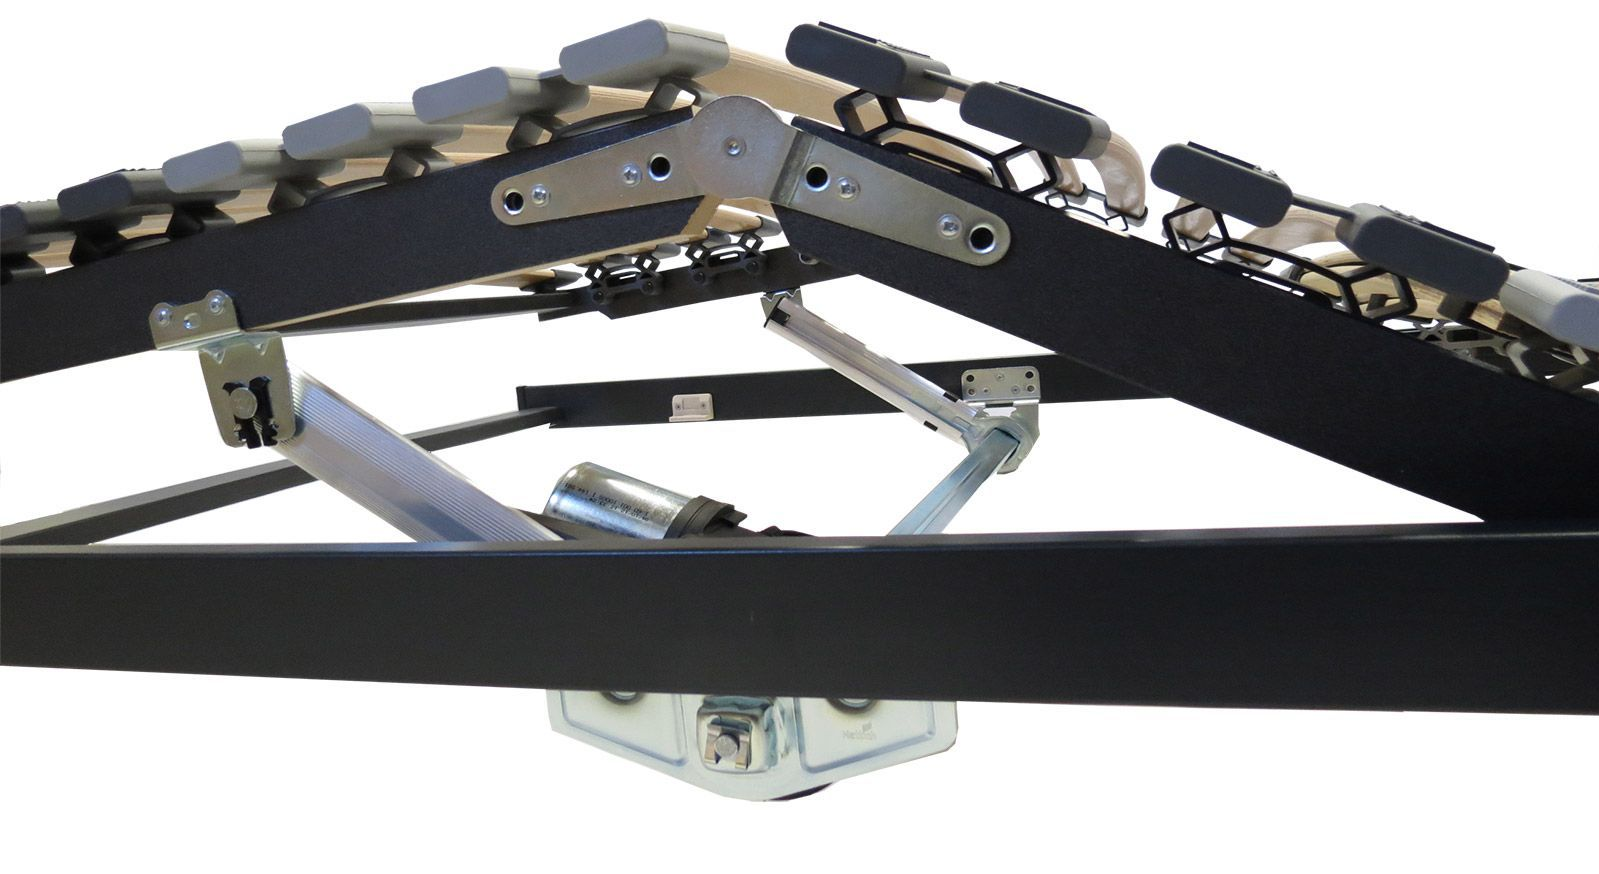 Detail des Lattenrostes orthowell ultraflex XL mit Motor